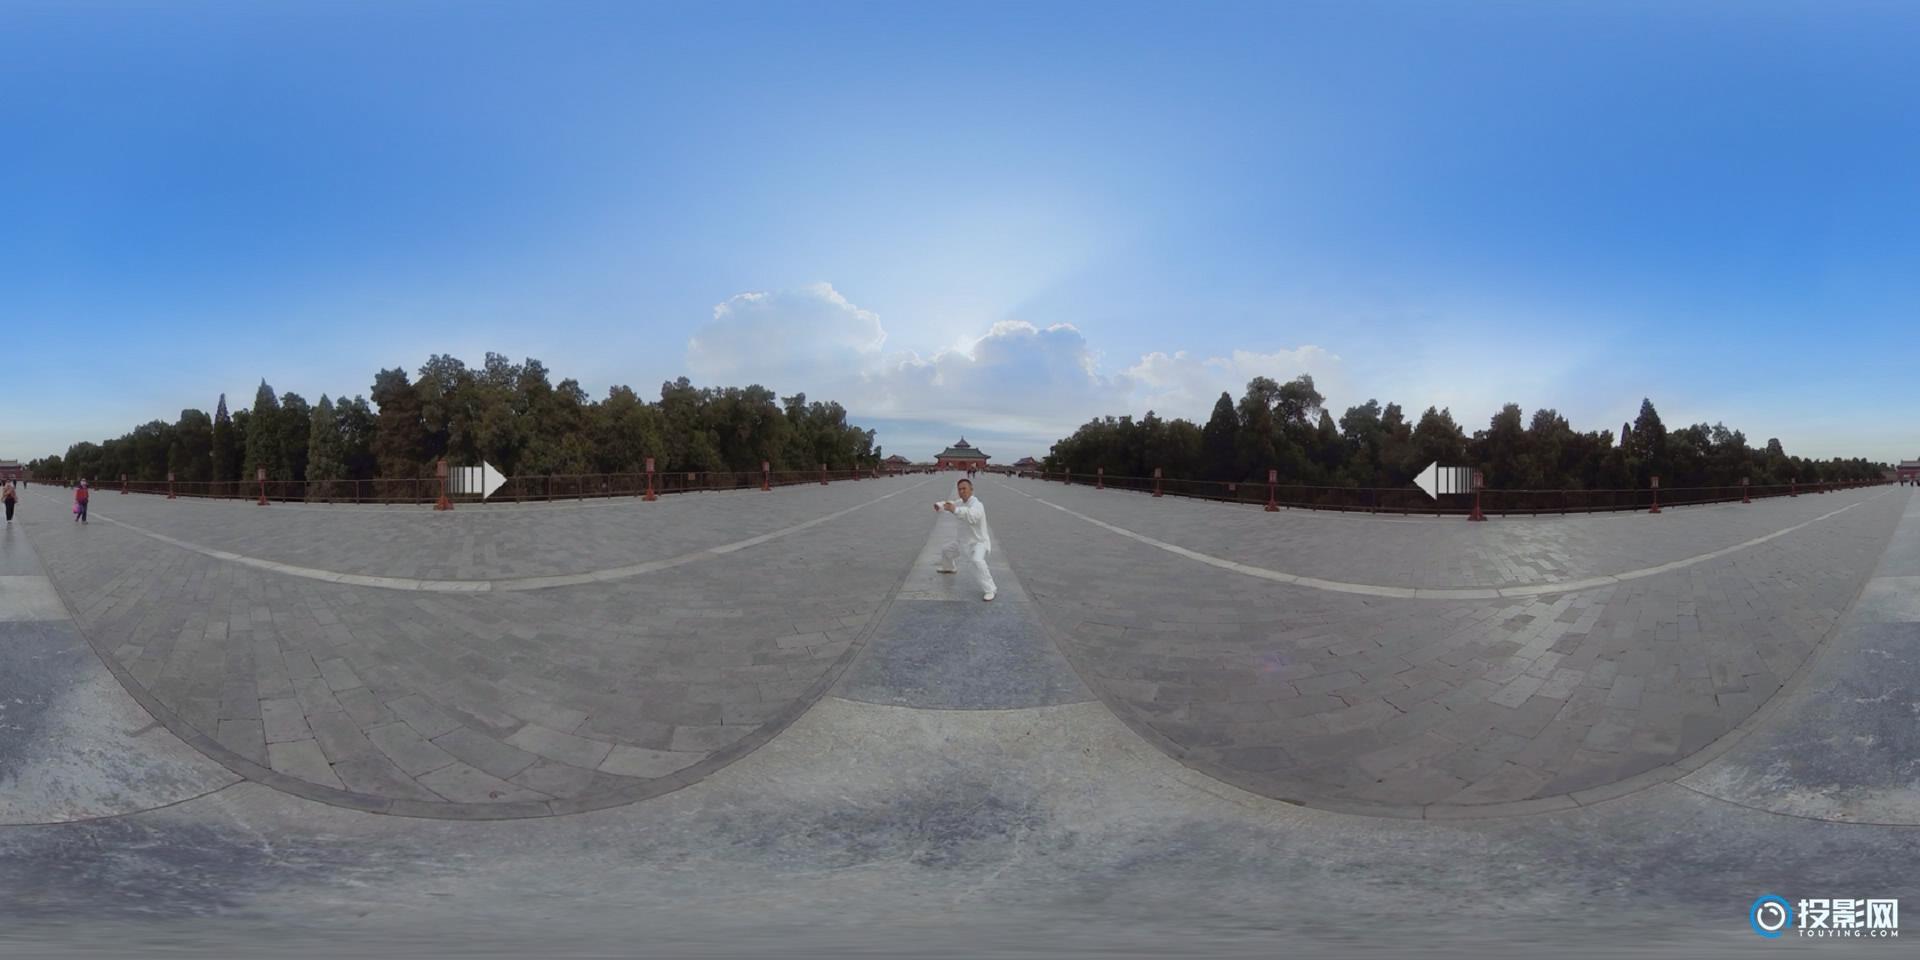 [VR360°全景] 北京行 VR视频下载